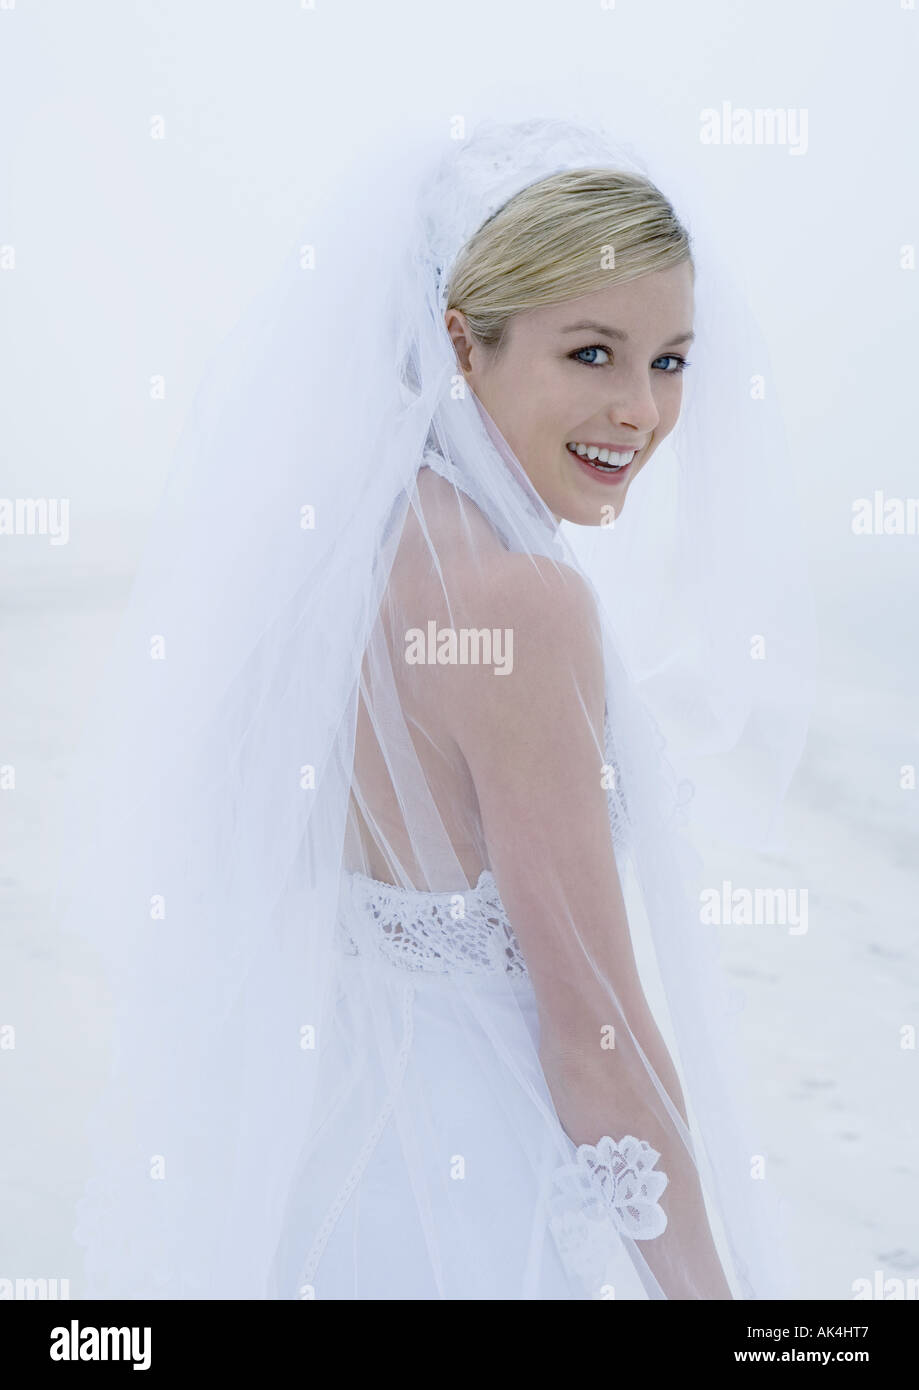 Bride looking over shoulder at camera - Stock Image